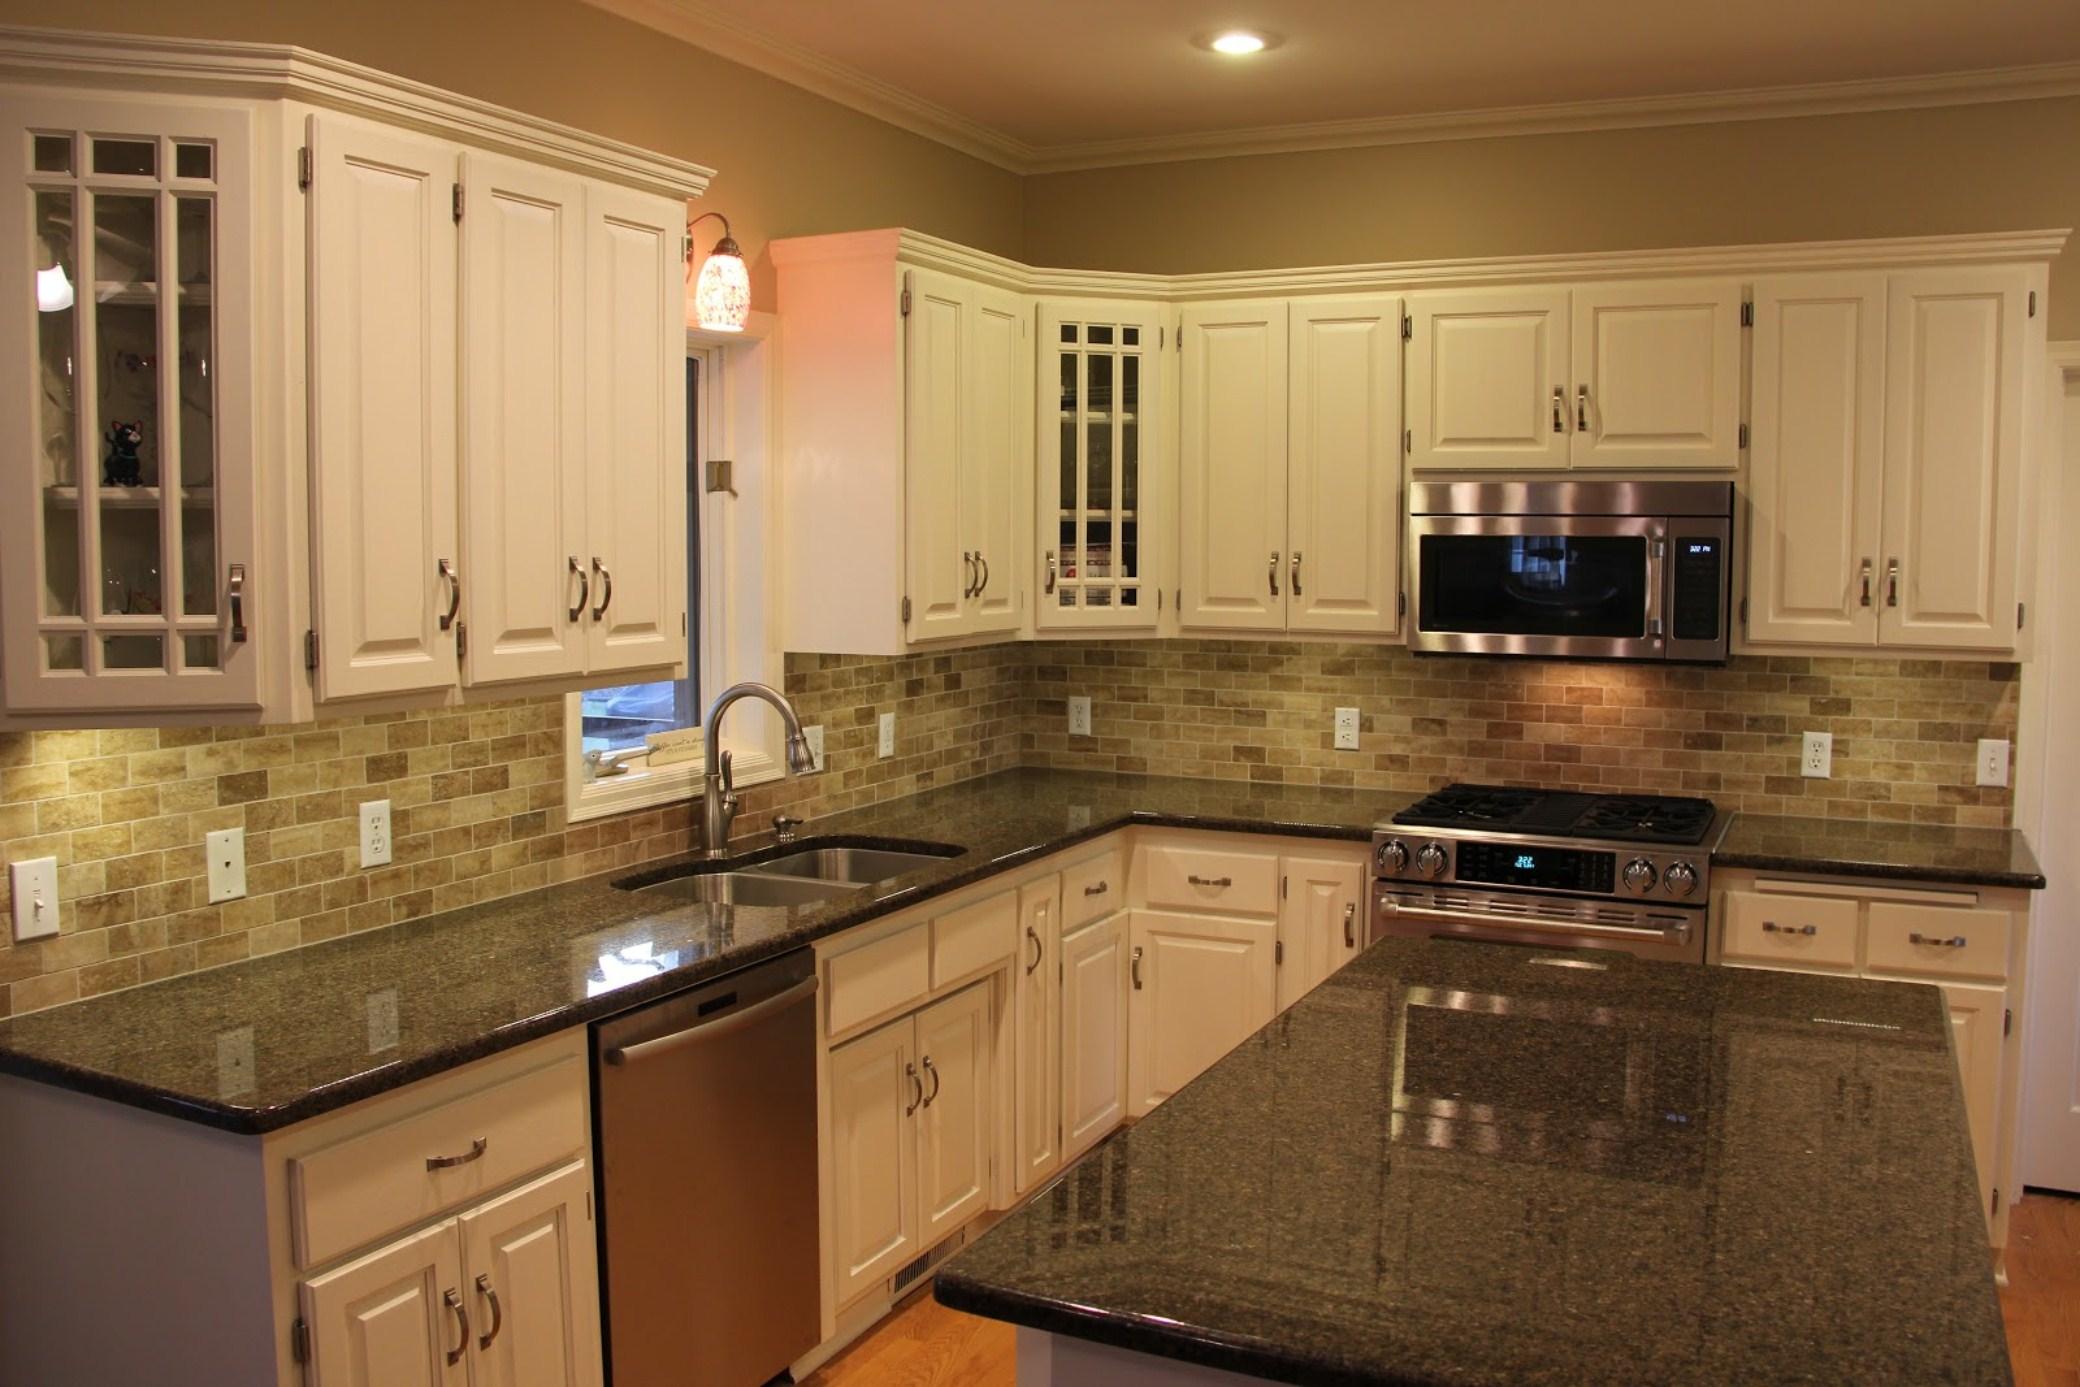 kitchen-white-cabinets-dark-countertops-photo-13